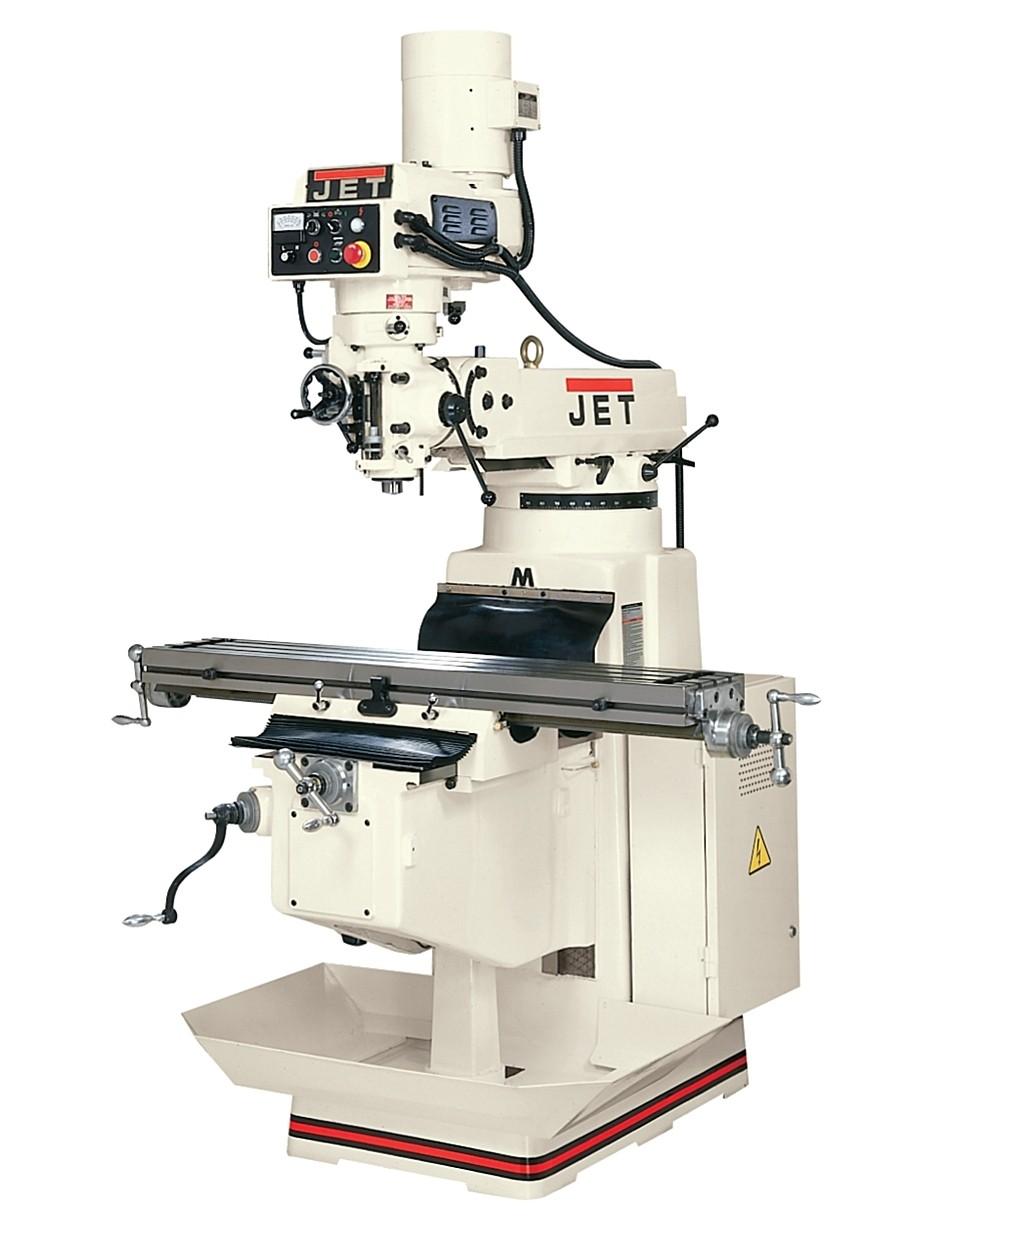 milling machine jet